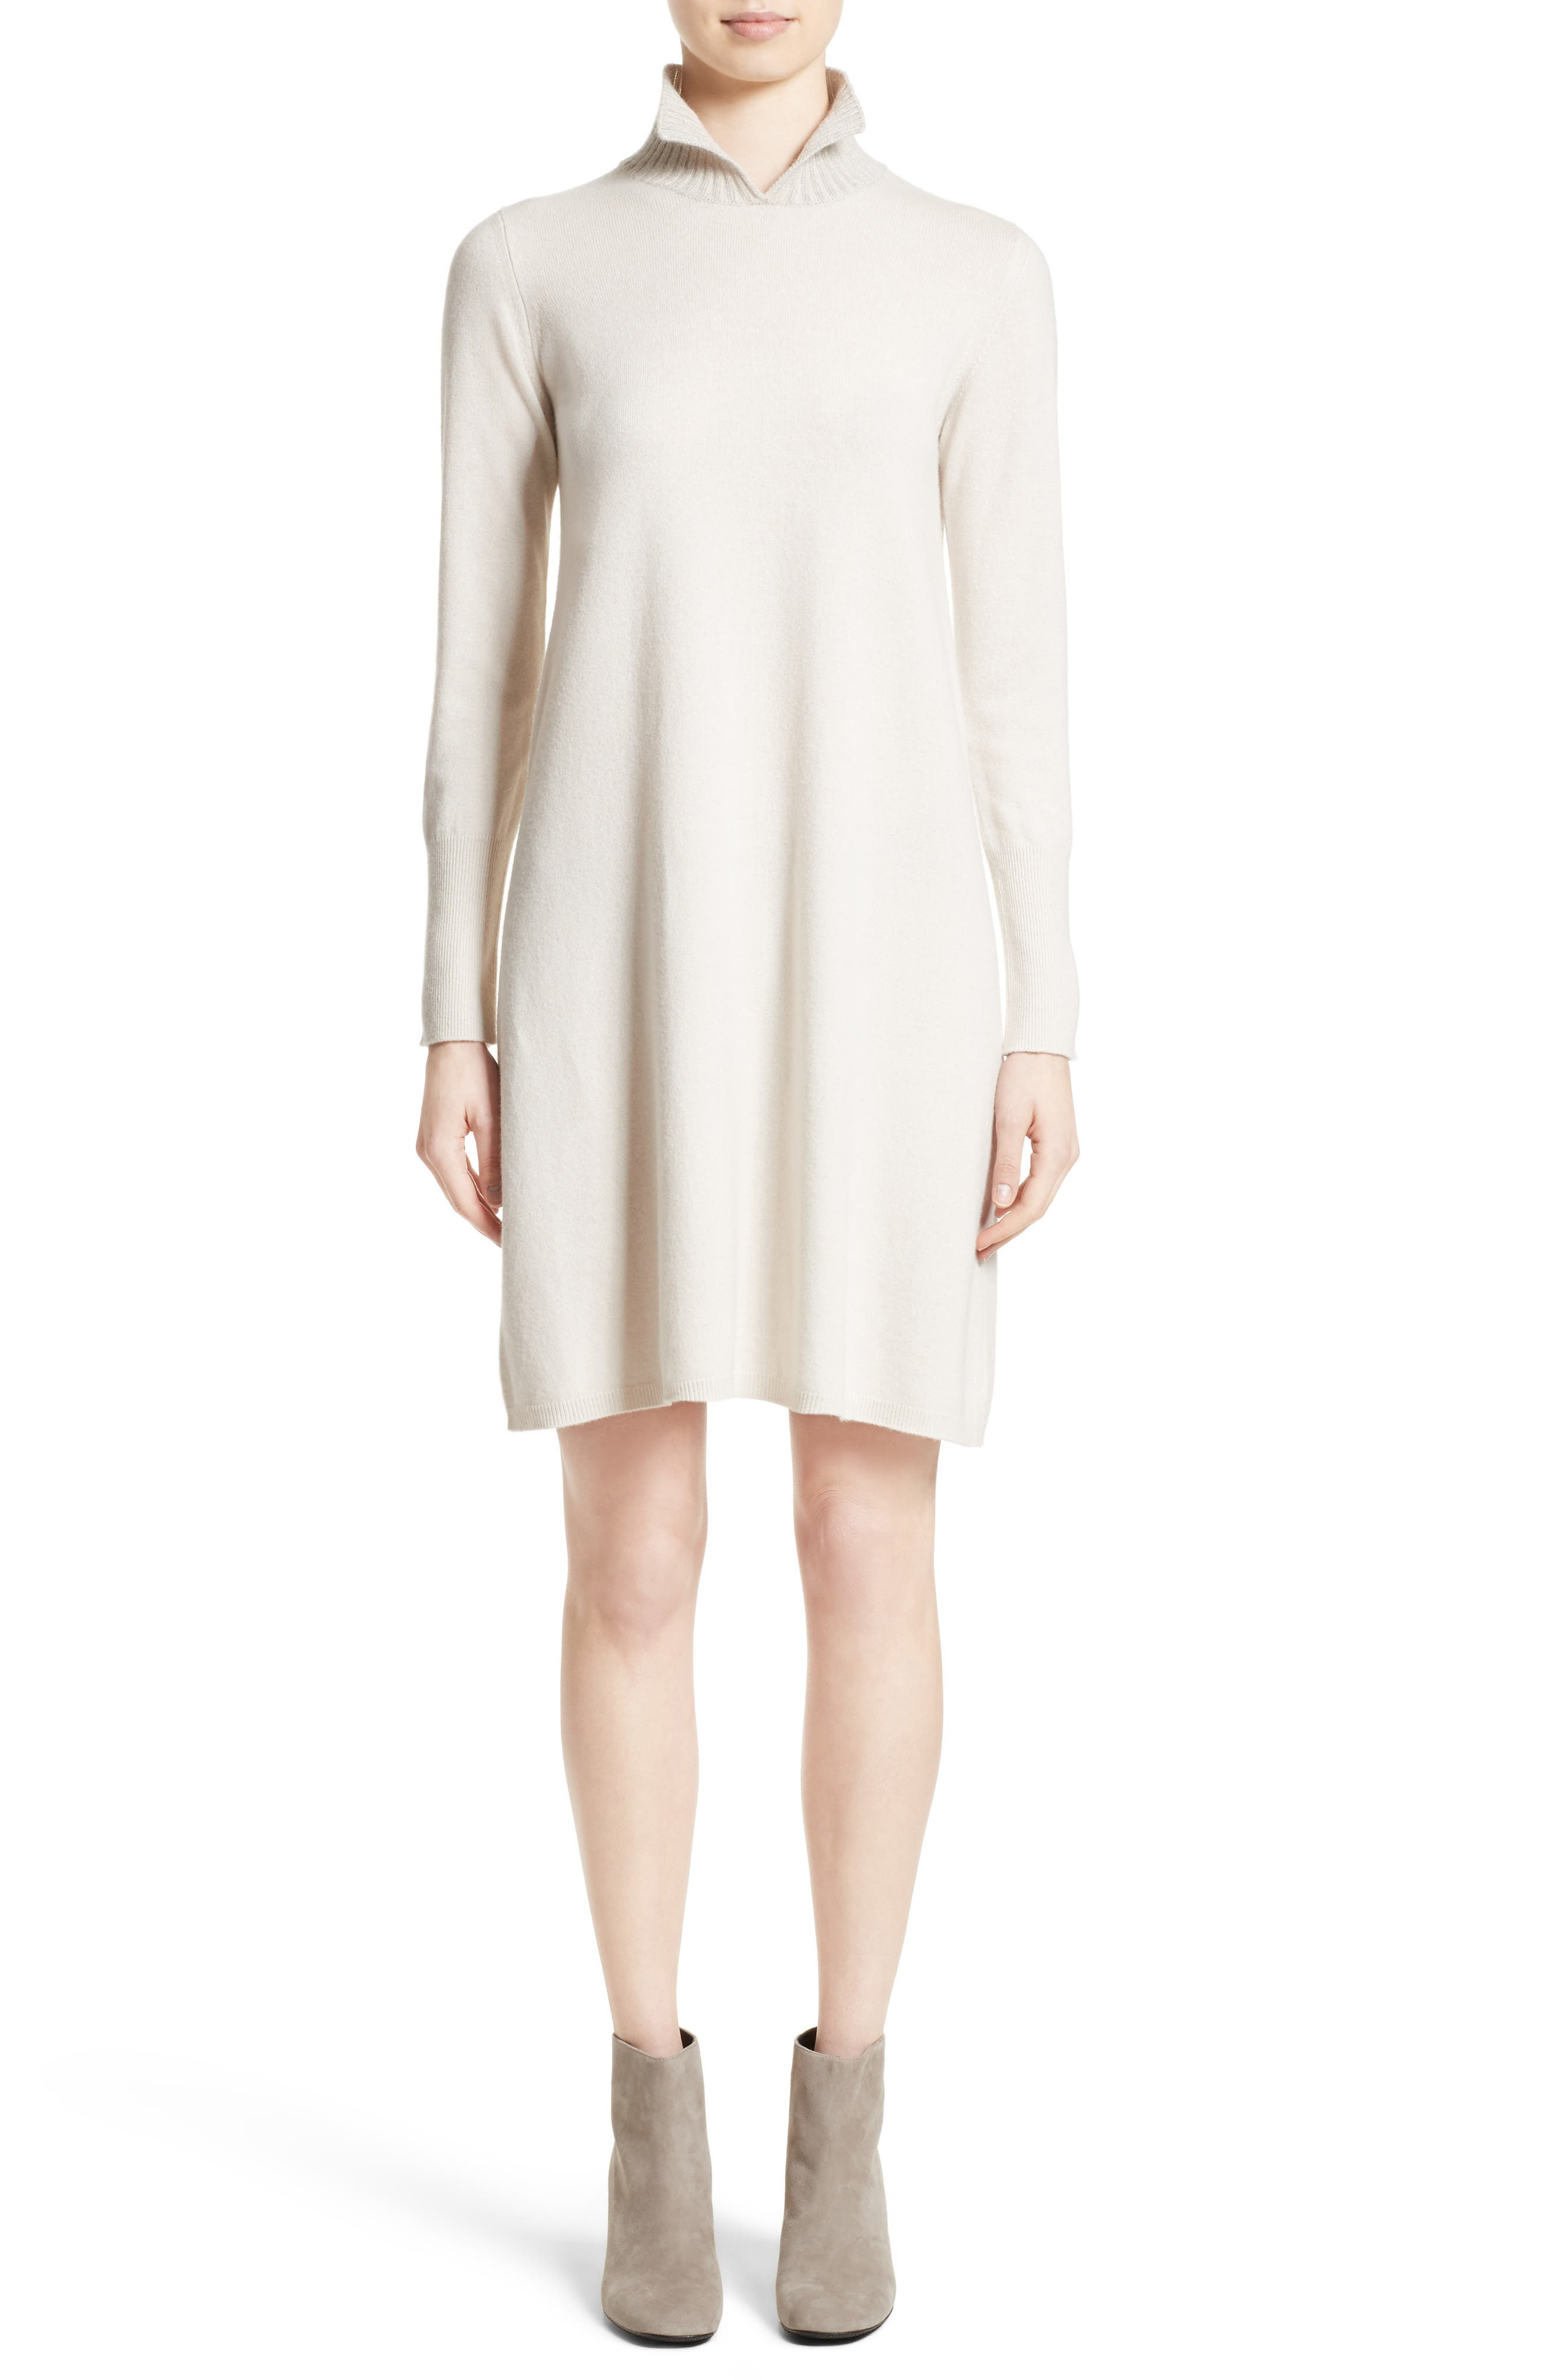 Wool, Silk & Cashmere Knit Dress,                         Main,                         color, 101